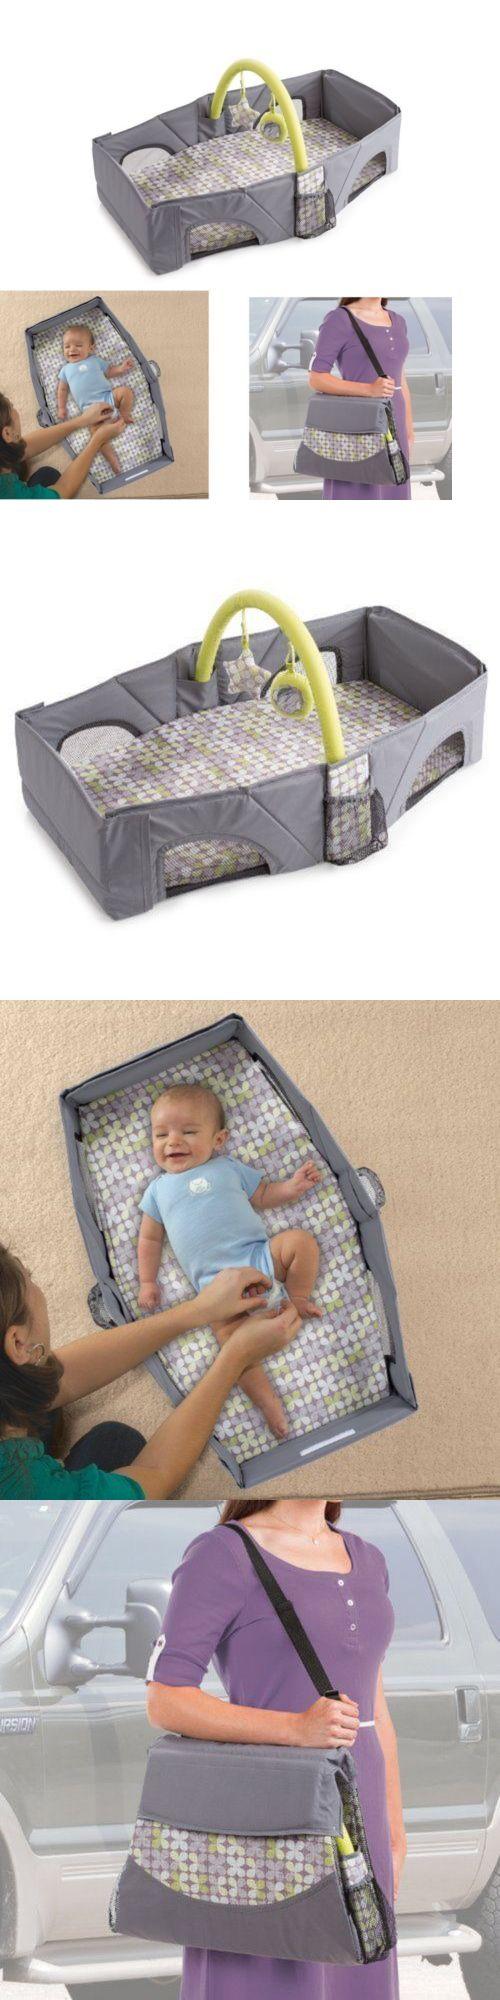 Special enclosed crib for premature babies - Baby Nursery Baby Bassinet New Infant Nursery Crib Cradle Bed Portable Basket Sleeper Newborn